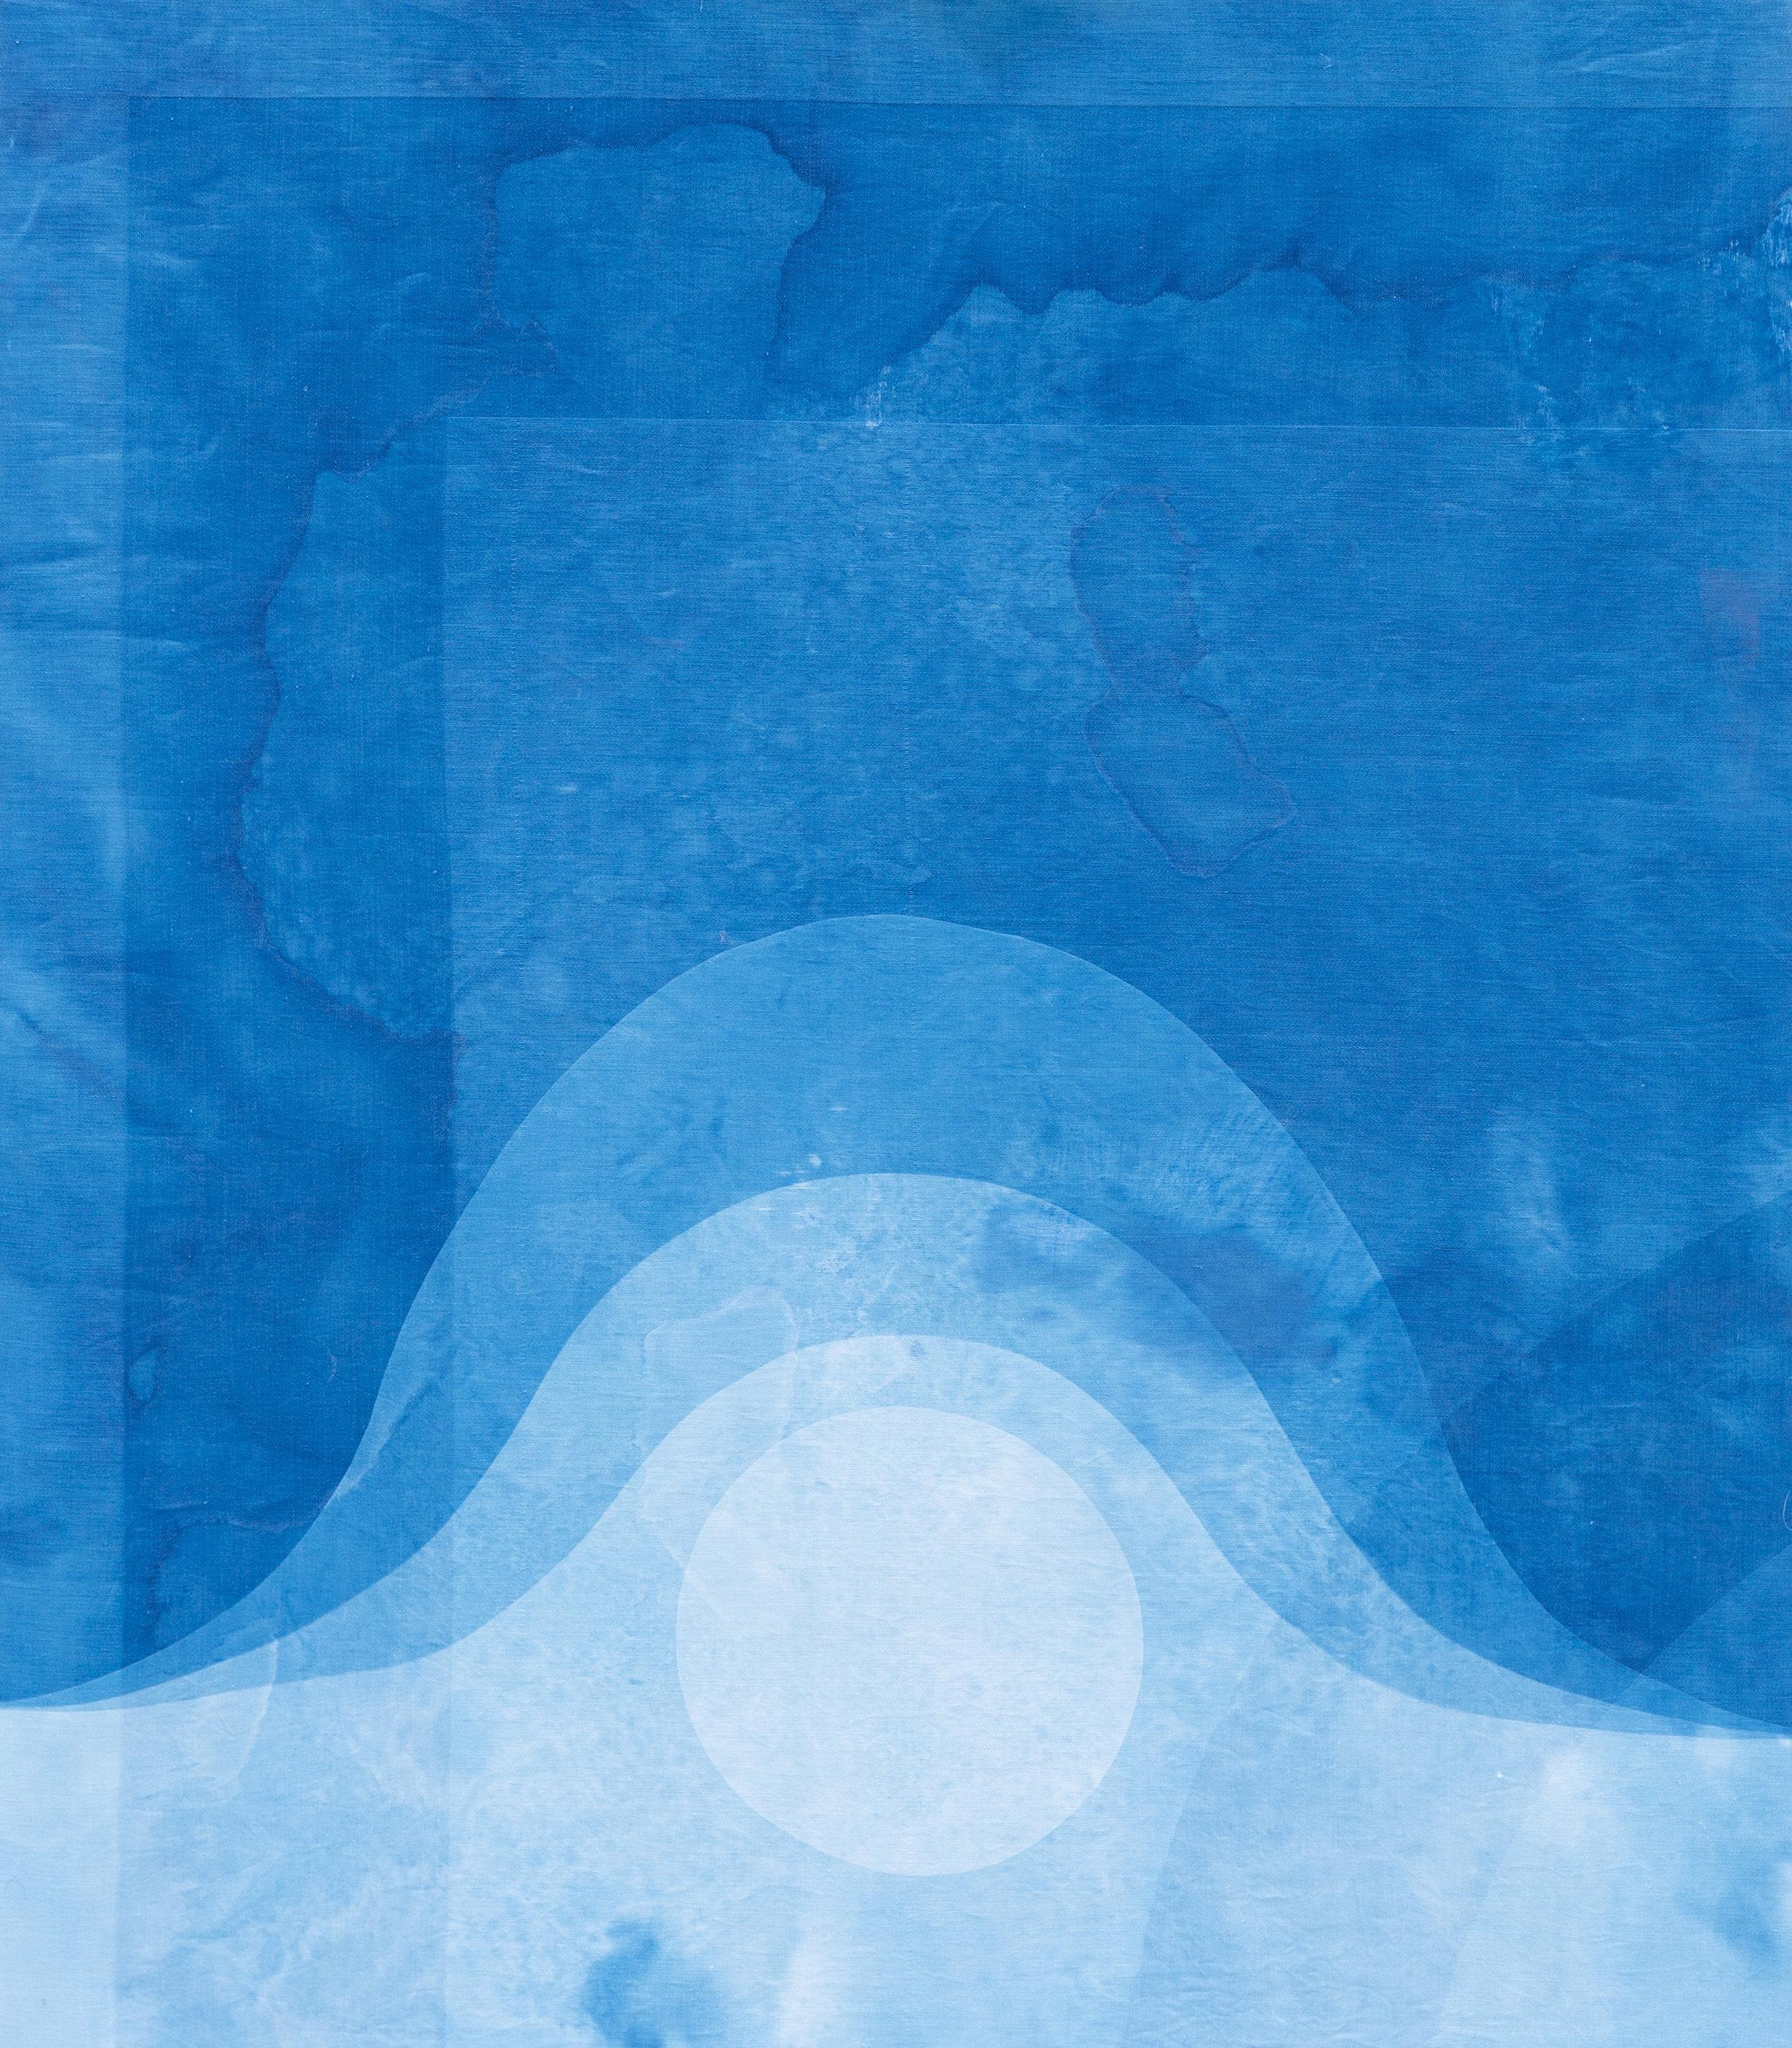 "moonrise, 2019, cyanotype on vintage linen damask stretched on wood frame, 32"" x 28"""